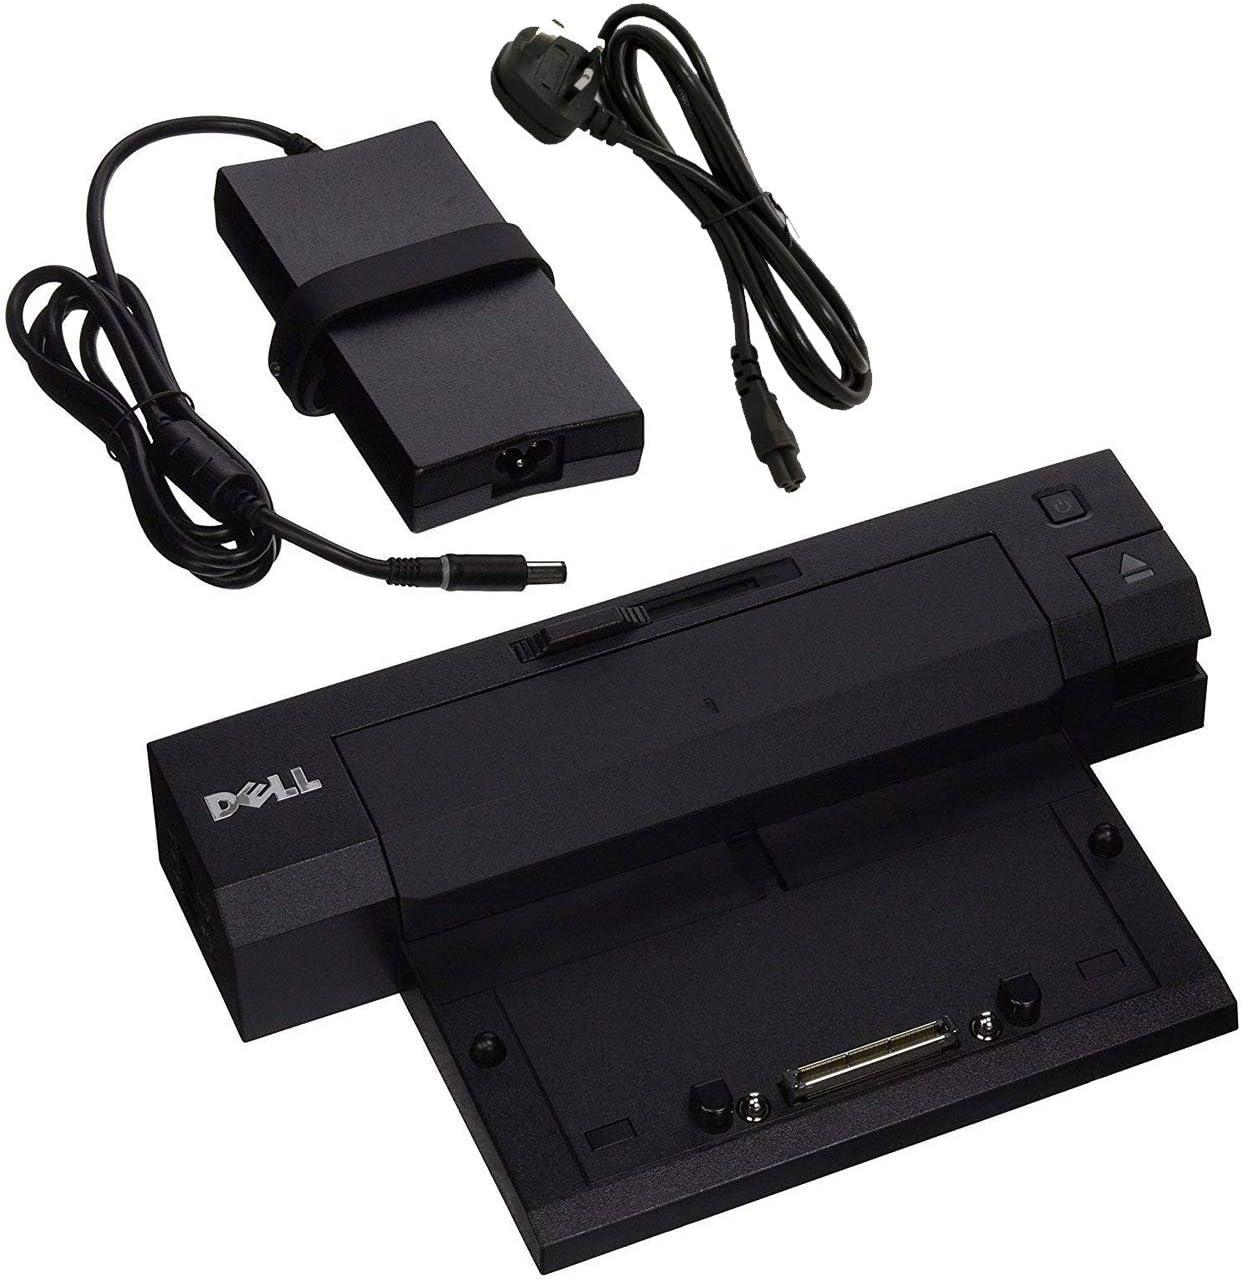 AC Latitude E6400 E6430 E6440 E6500 Dell E-Port Plus II USB 3.0 Docking Station